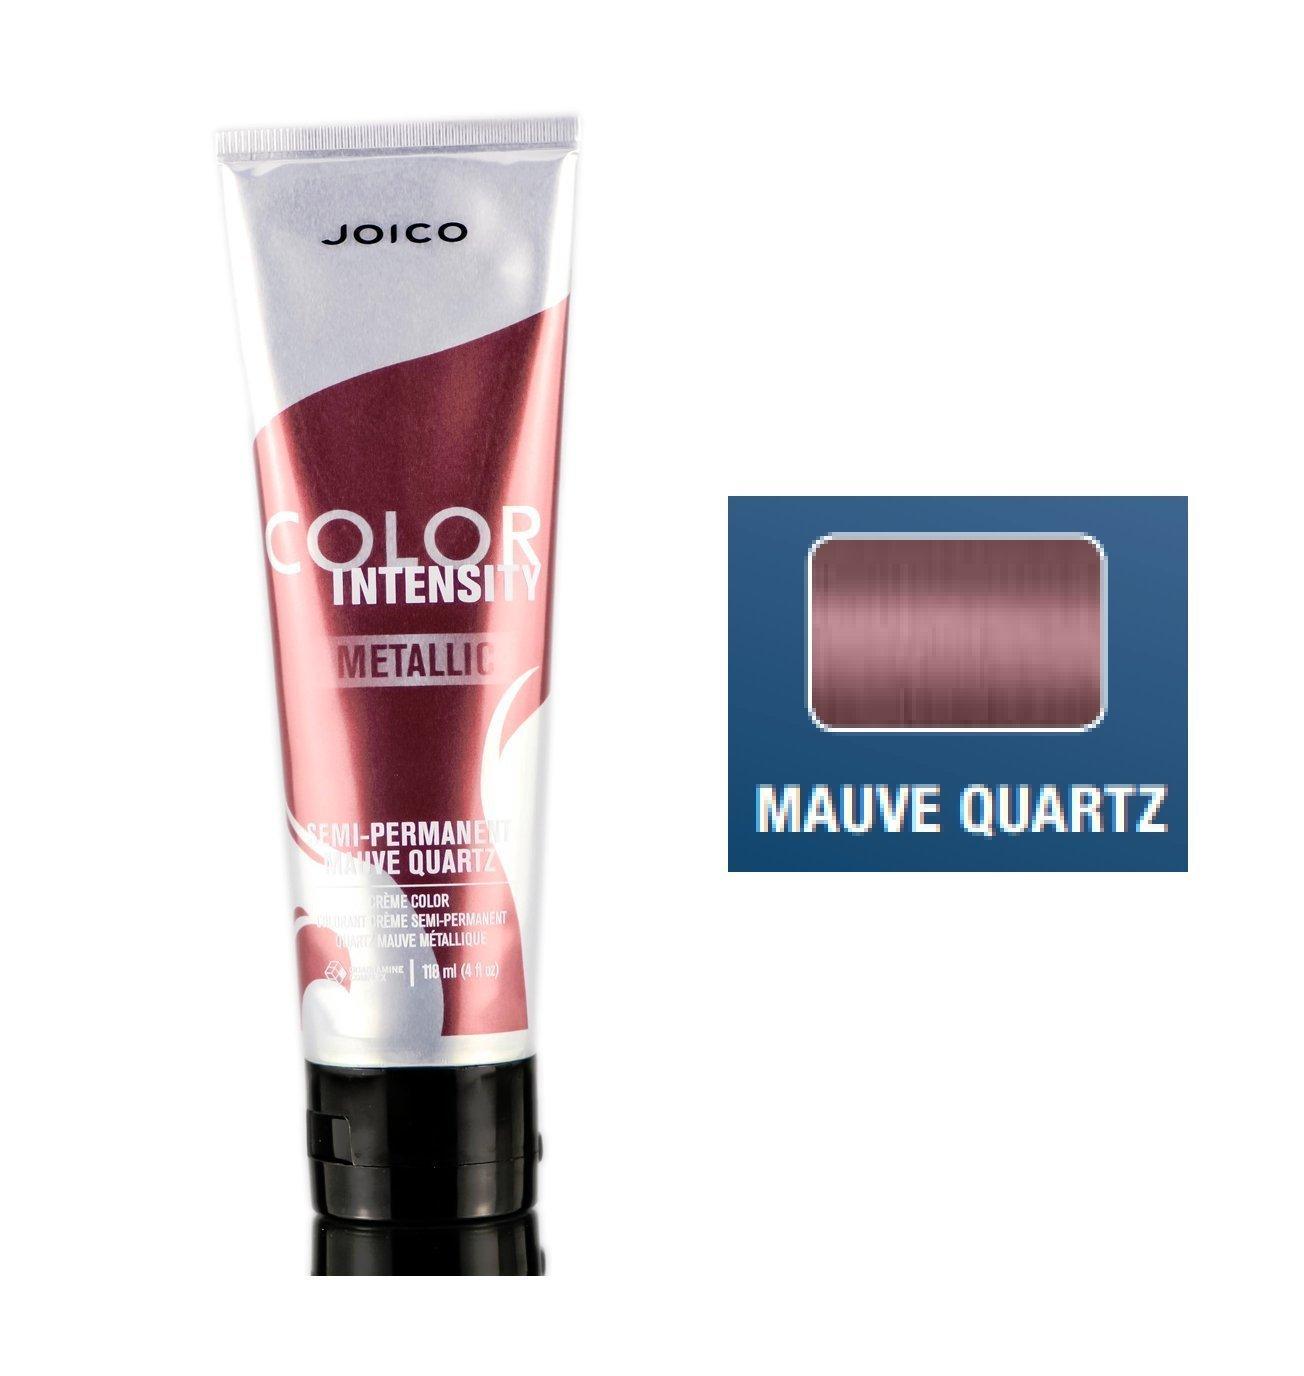 Joico hair color tags color jocio joico - Amazon Com Joico Color Intensity Metallic Semi Permanent Creme Hair Color With Sleek Tint Brush Pewter Beauty